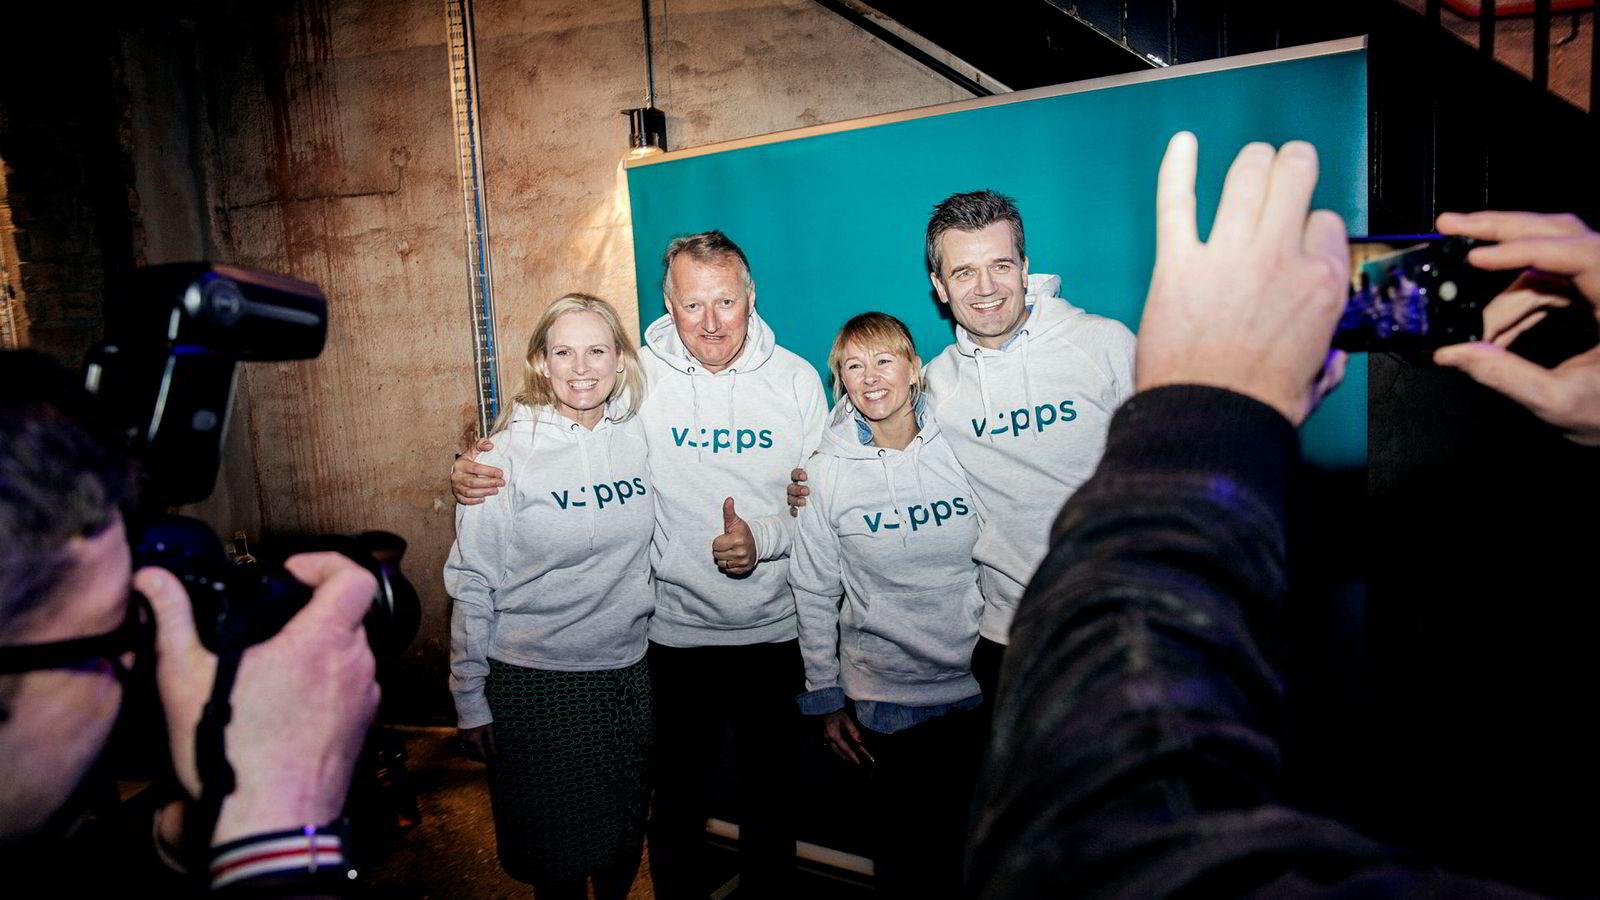 Hvordan DNB har dyrket frem betalingstjenesten Vipps er et godt eksempel på digitalisering. Her fra pressekonferansen hvor 100 norske banker går inn i Vipps-samarbeidet. Fra venstre: Hege Toft Karlsen (konsernsjef i Eika Gruppen), Rune Bjerke (konsernsjef i DNB), Elisabeth Haug (administrerende direktør i Sparebank 1 Mobilbetaling (Mcash)) og Rune Garborg (konserndirektør Vipps og betaling i DNB).